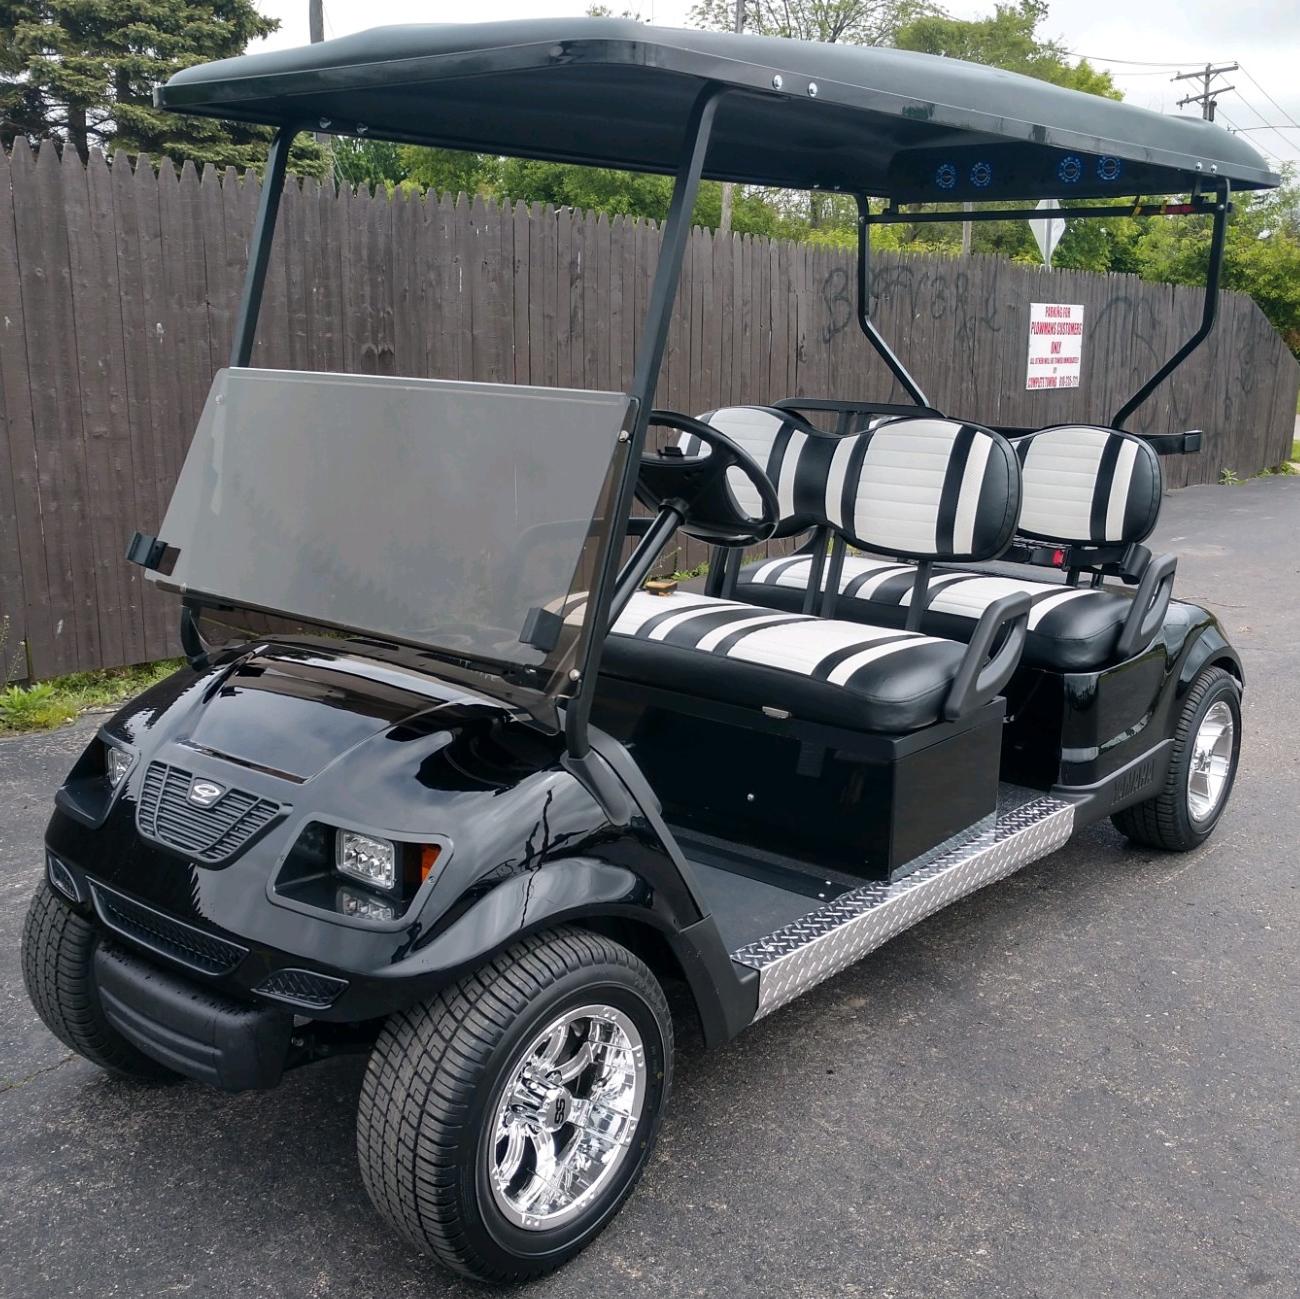 Plowman's Carts - Golf Cars - Golf Cars, Golf Carts and Utility